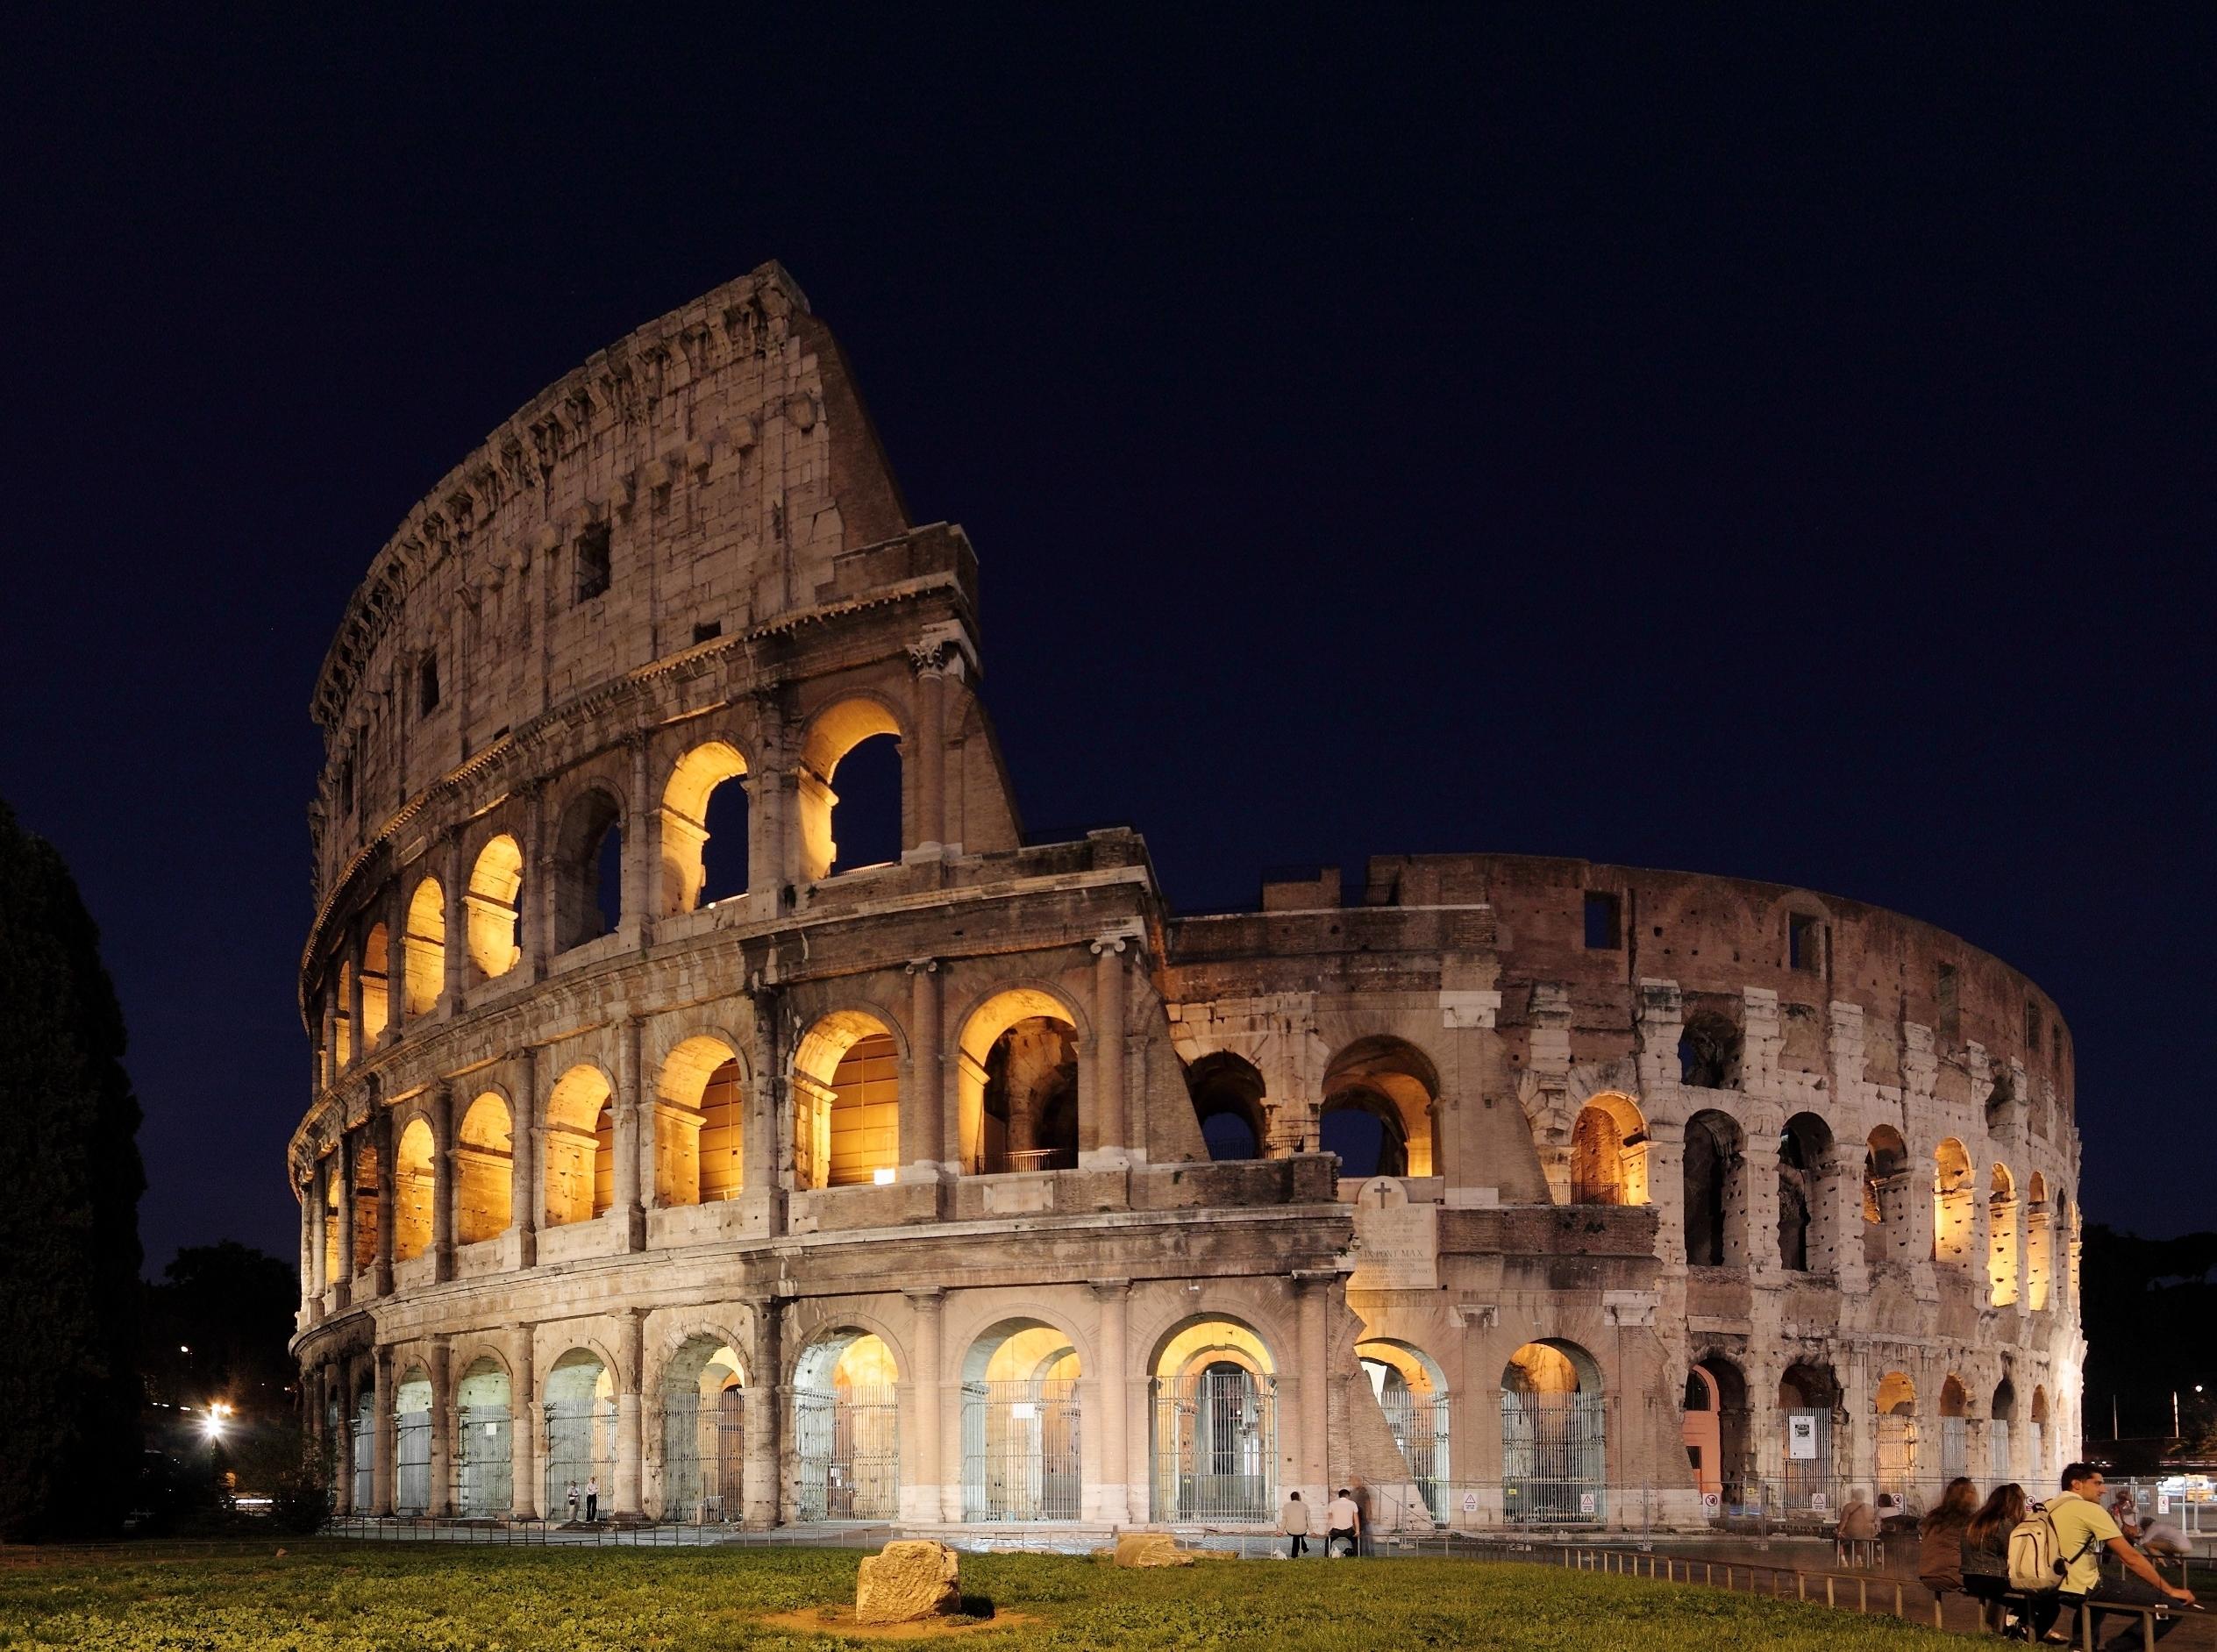 Bus Tour Rome To Amalfi Coast